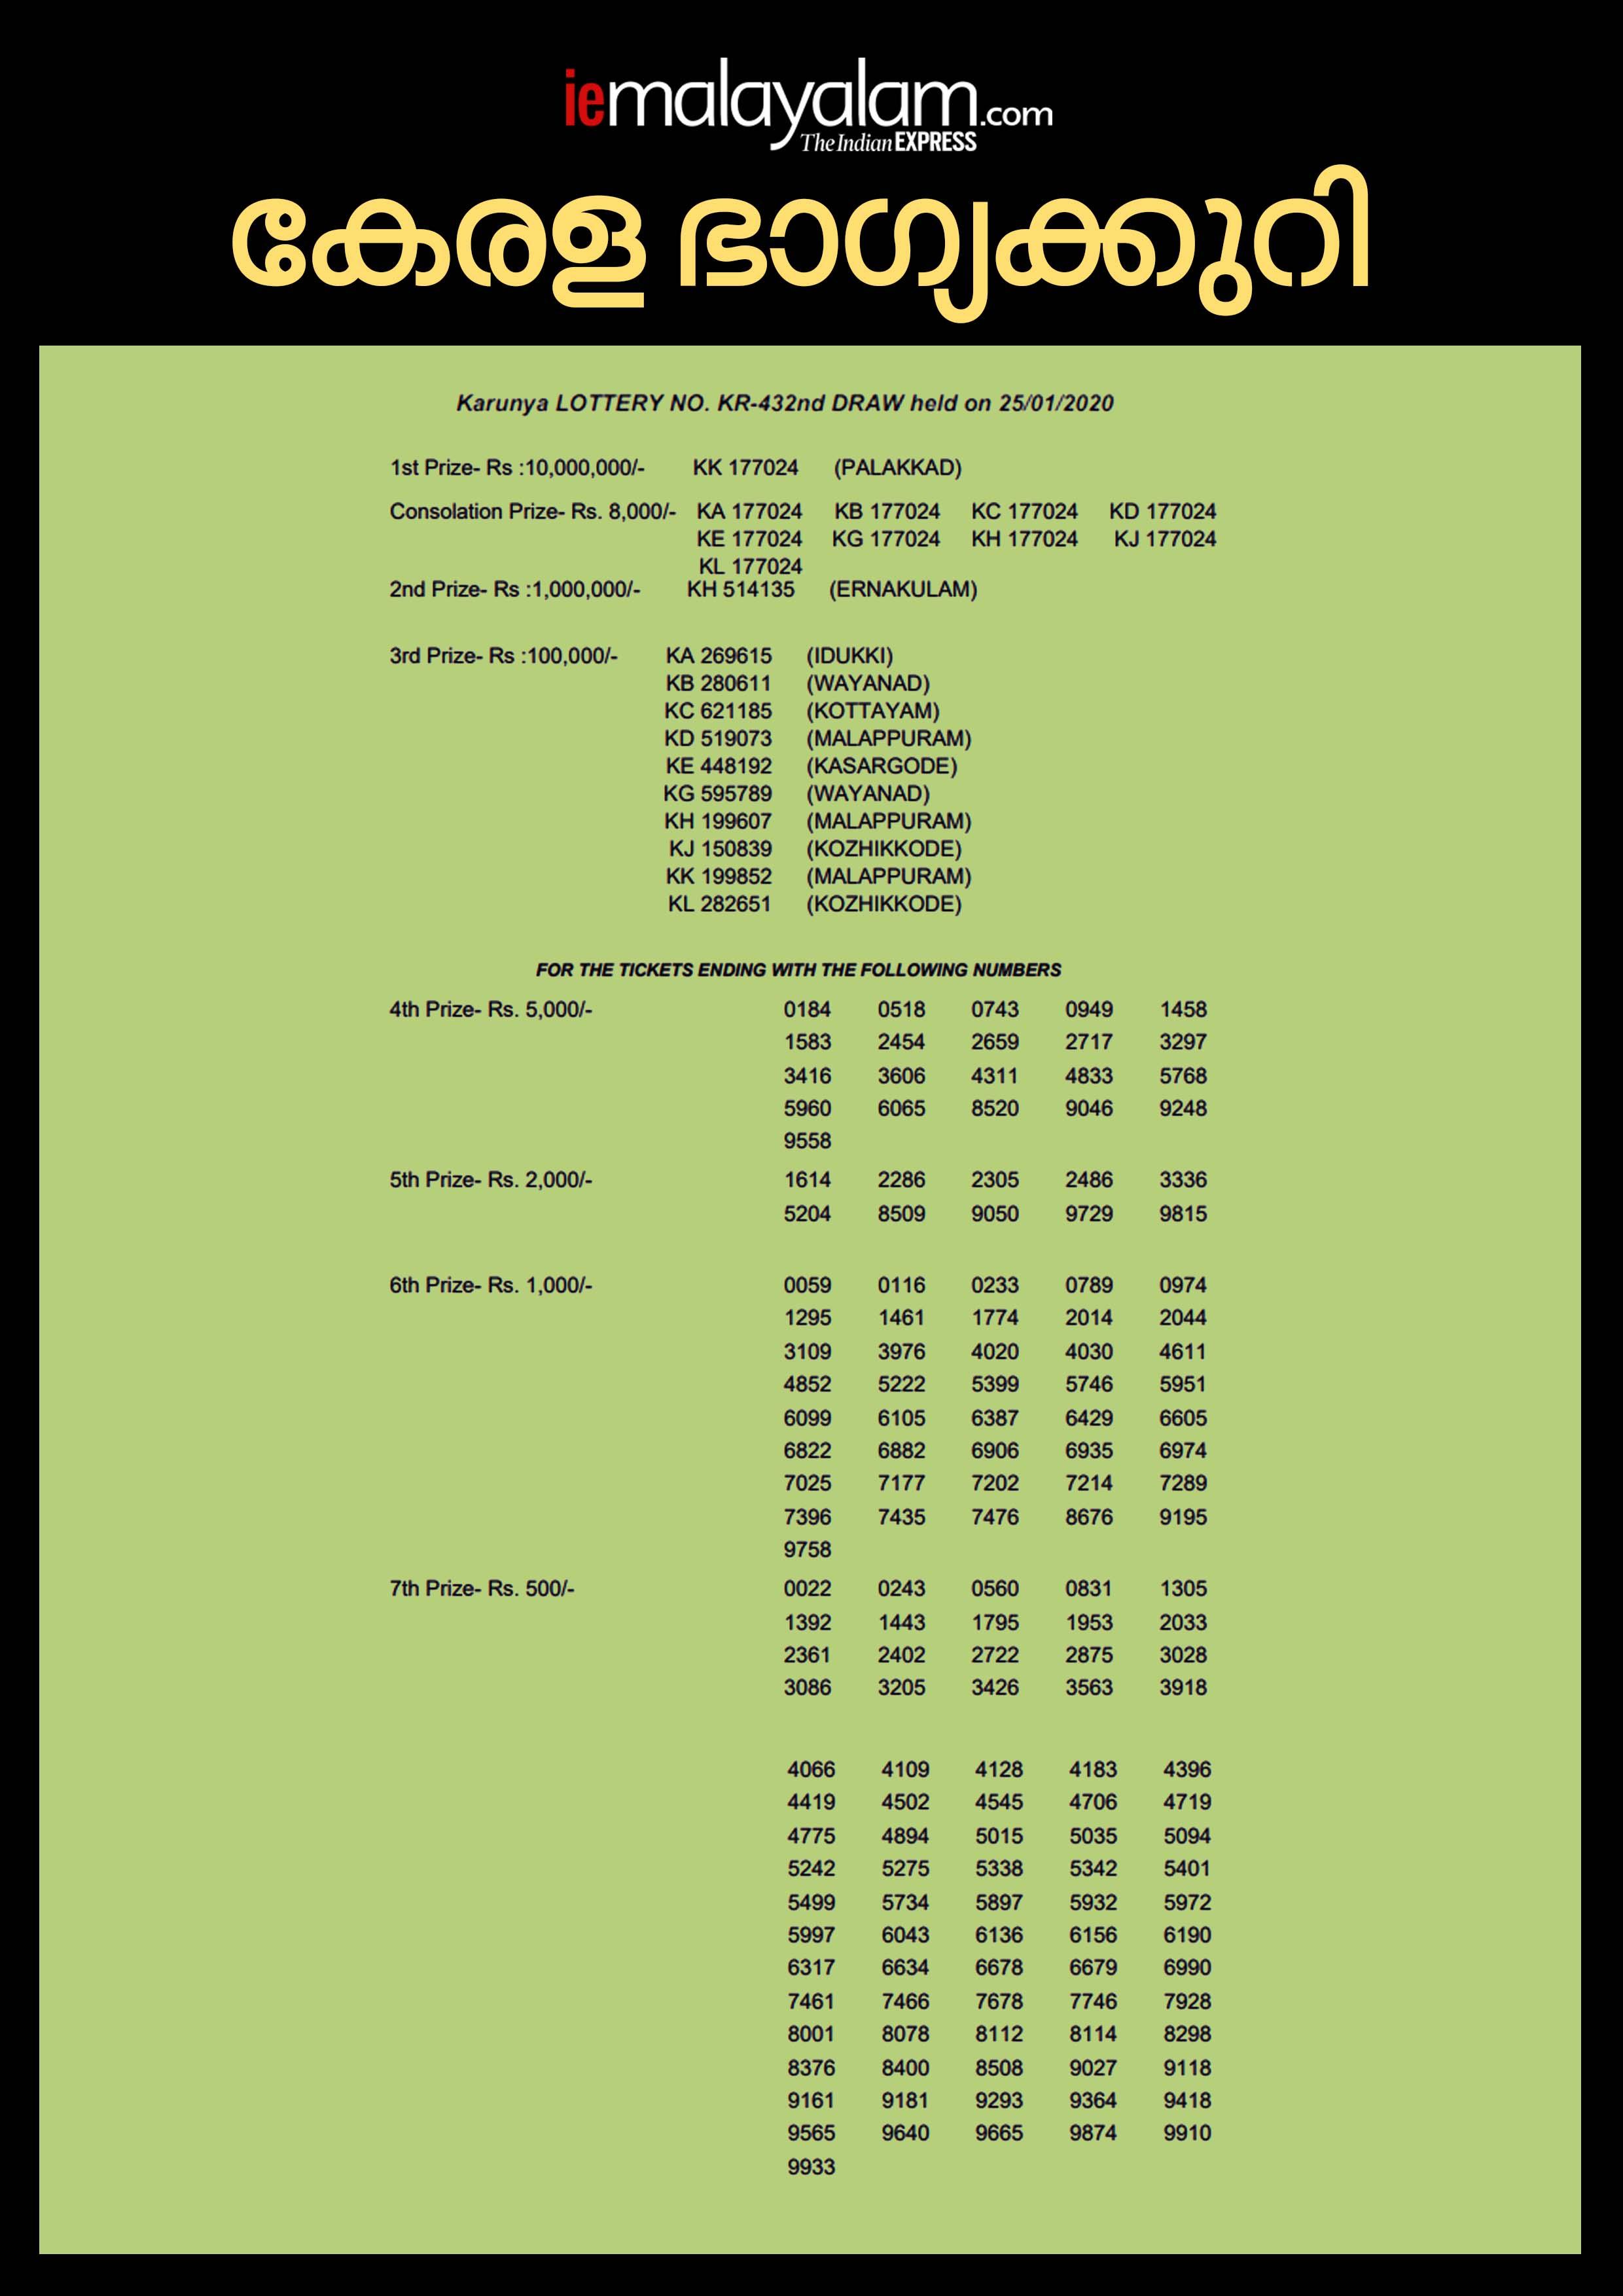 Karunya Lottery KR 432 Result, kerala lottery, ie malayalam